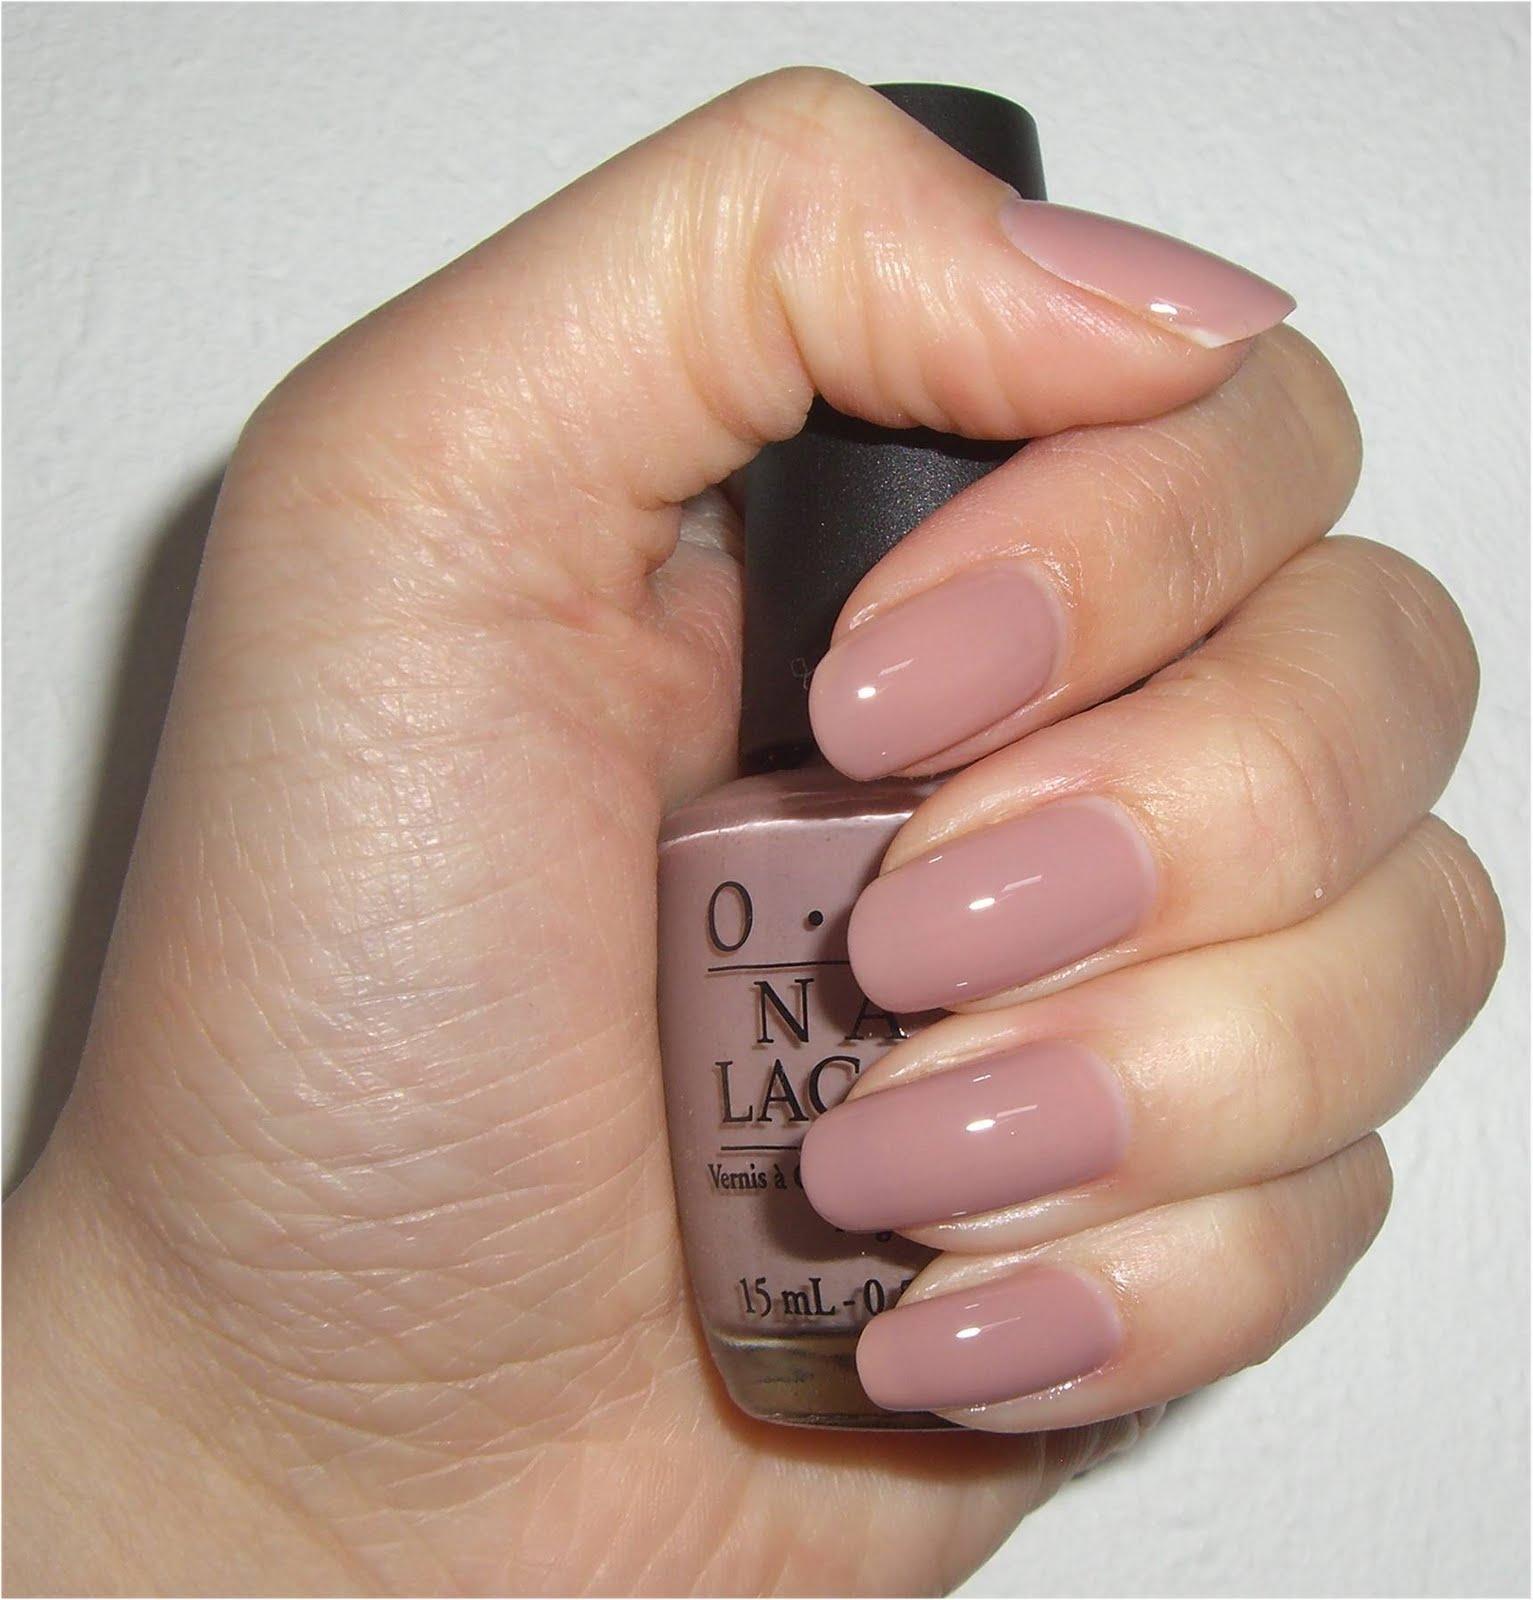 Nude Farben Beige Farbe Hellbrauner UV Nagellackfarbe